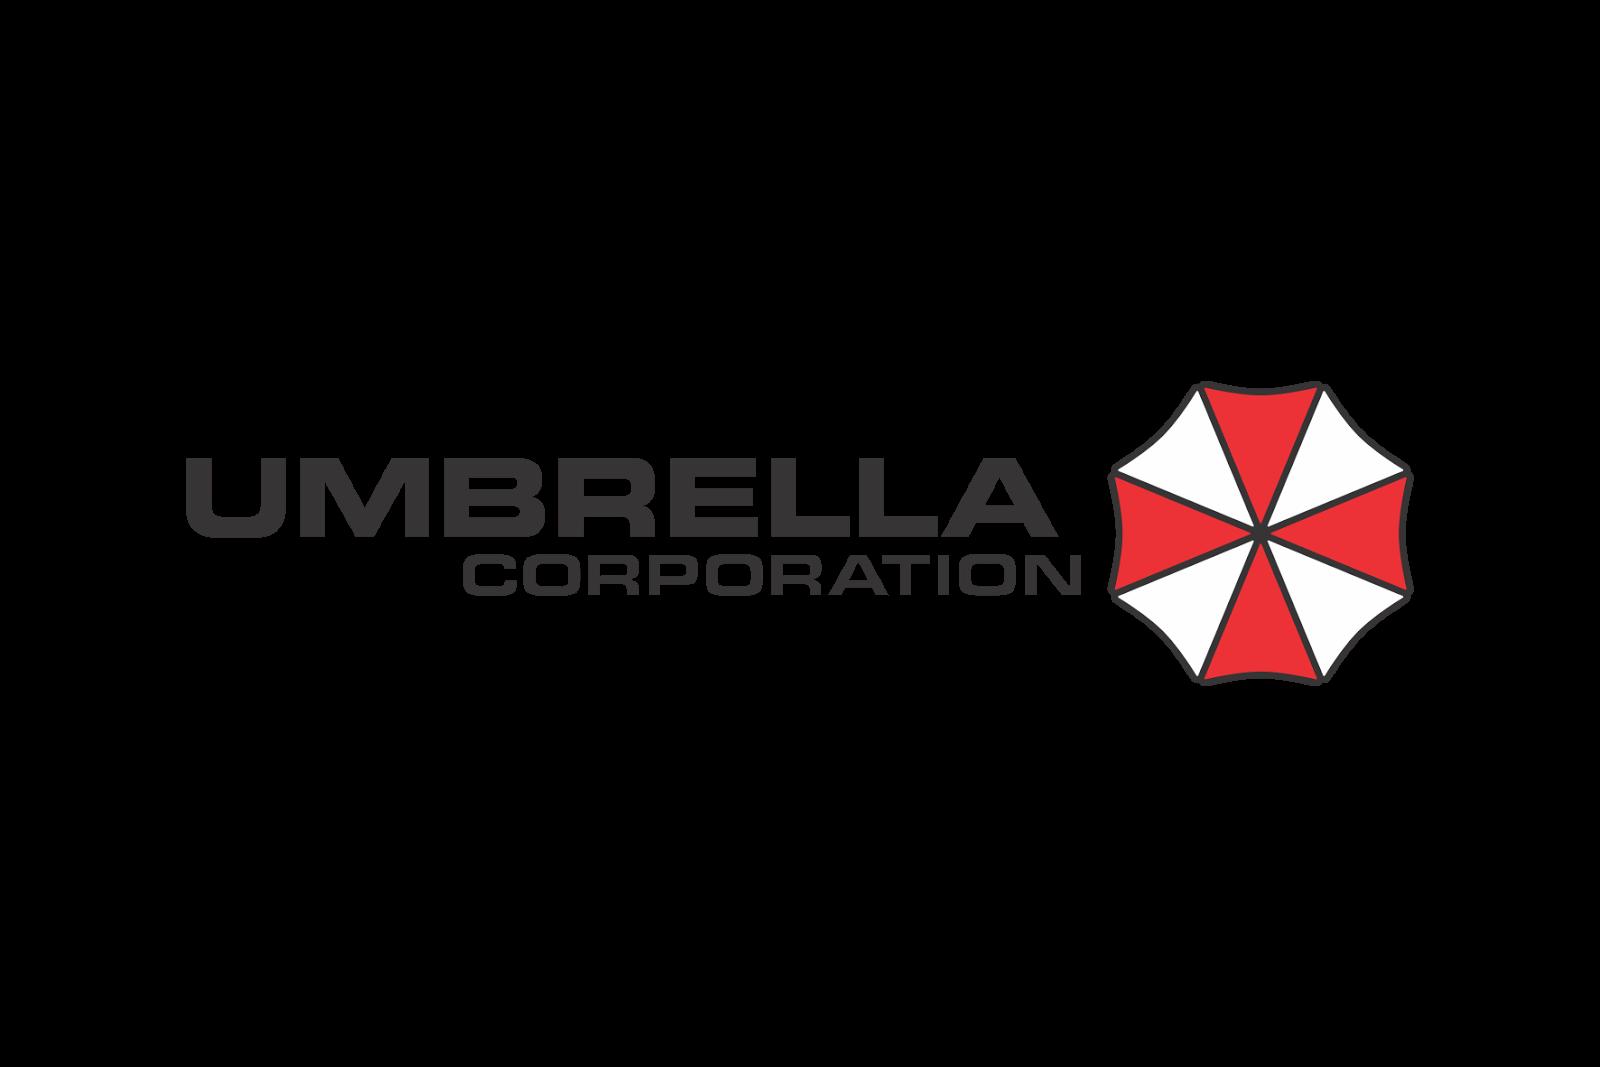 umbrella corporation logo artwork clipart black and white artwork clip art preschool